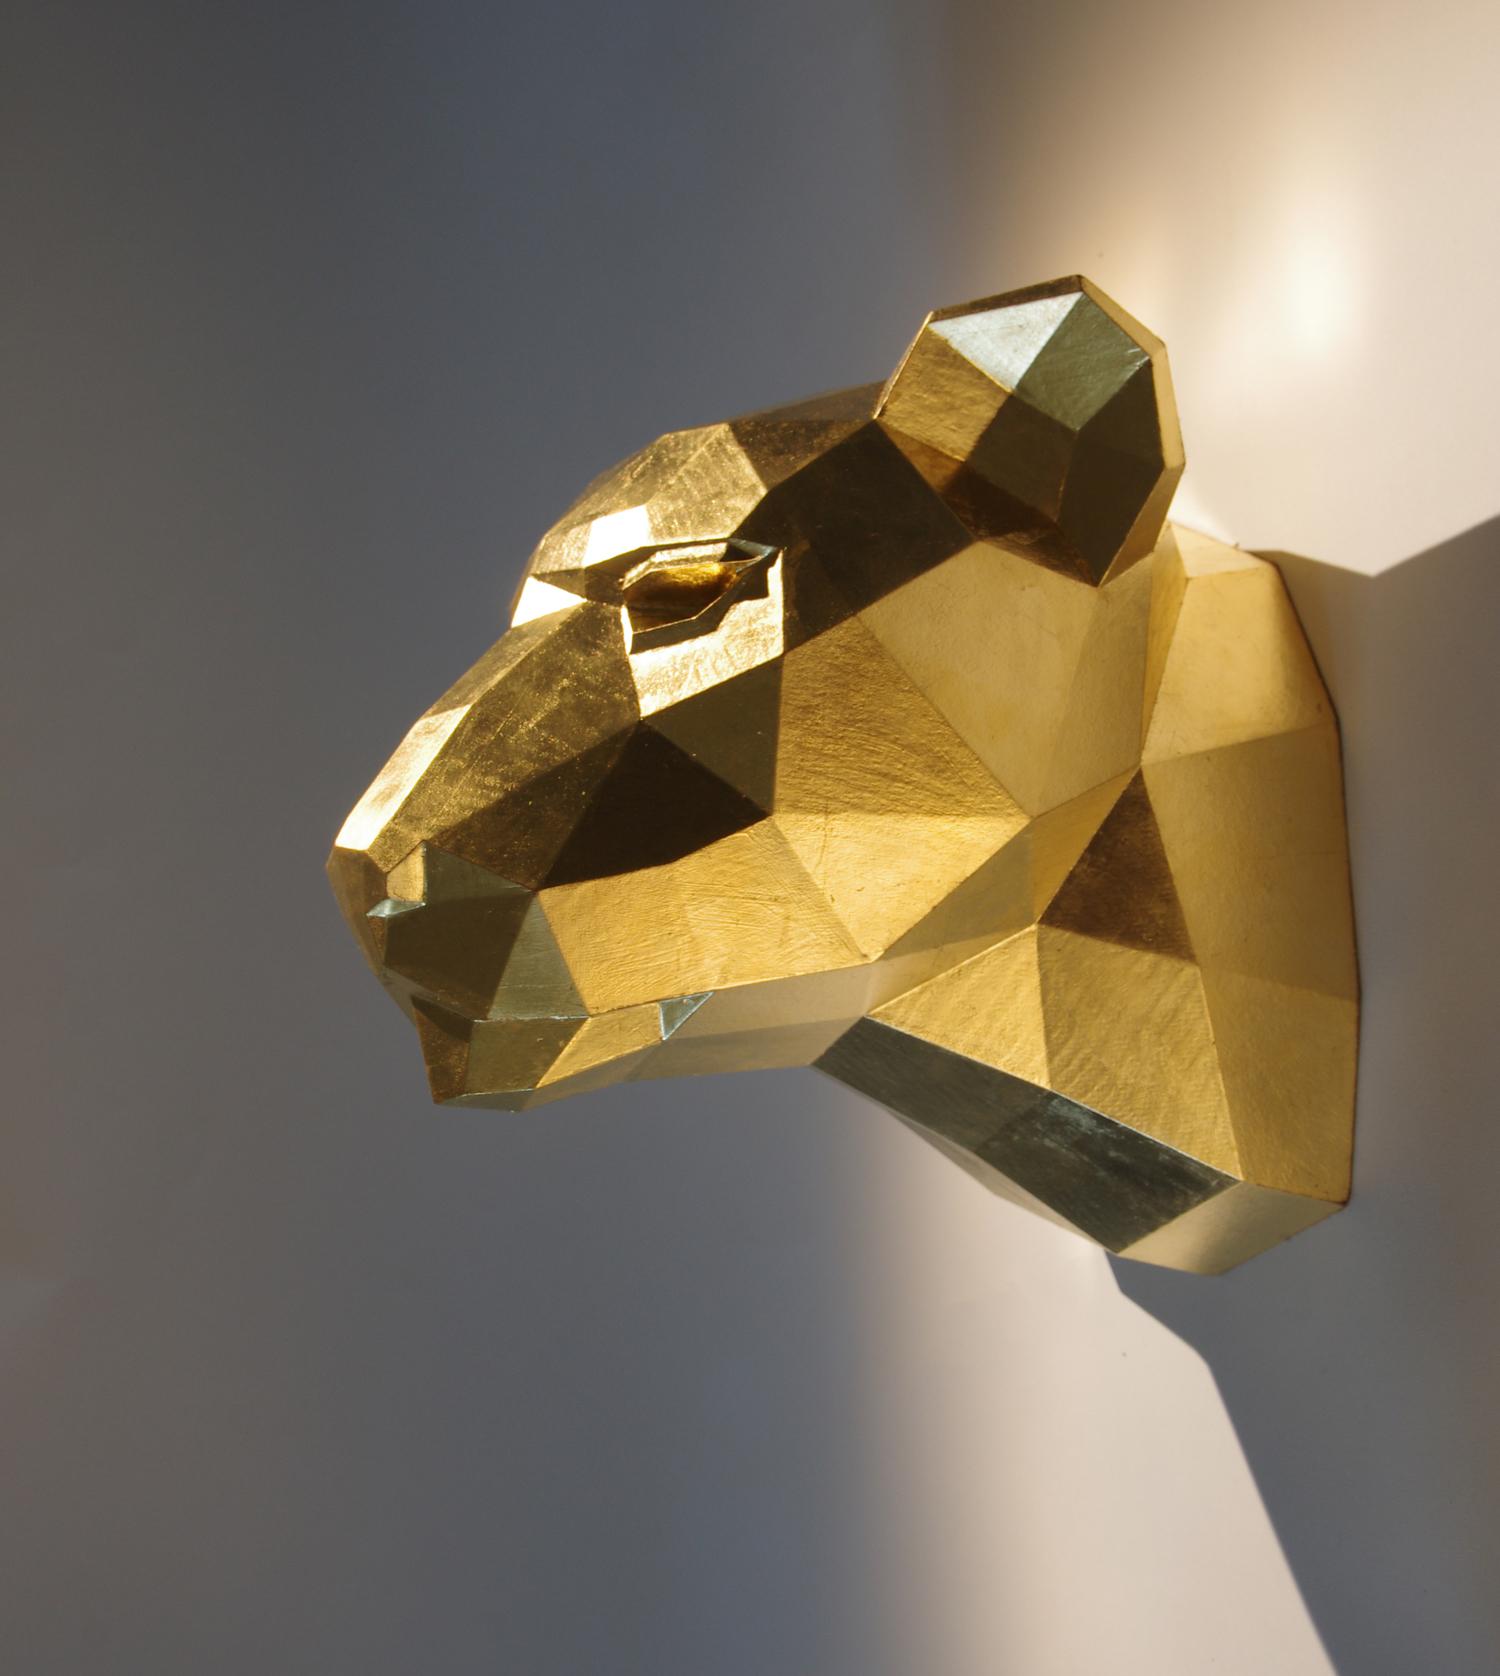 Paperwolf